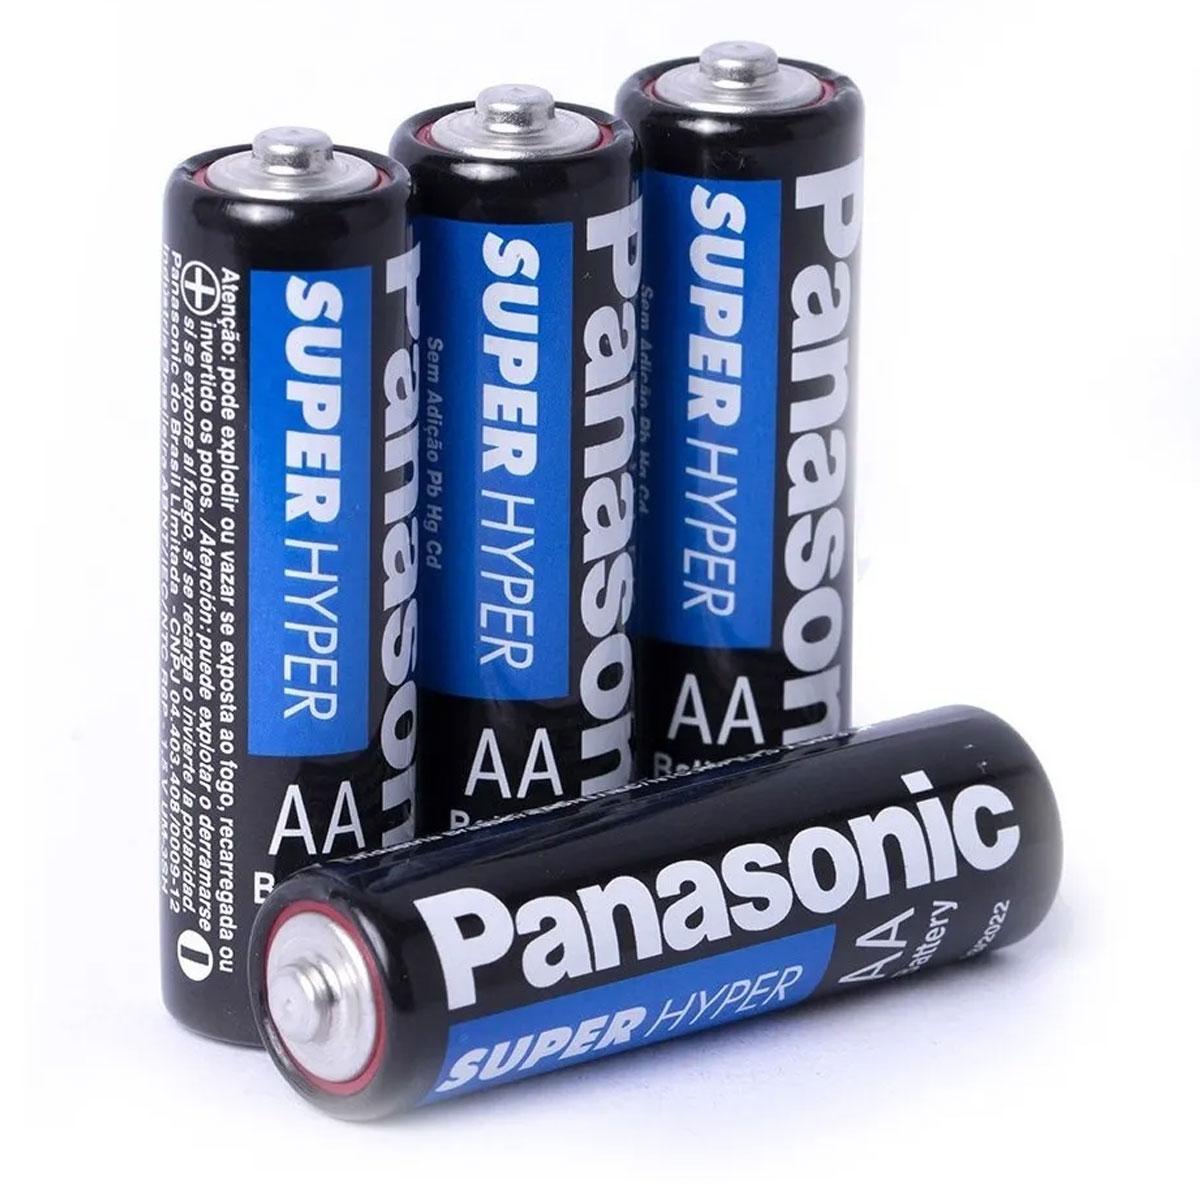 4x Pilha Panasonic AA - Super Hyper Comum